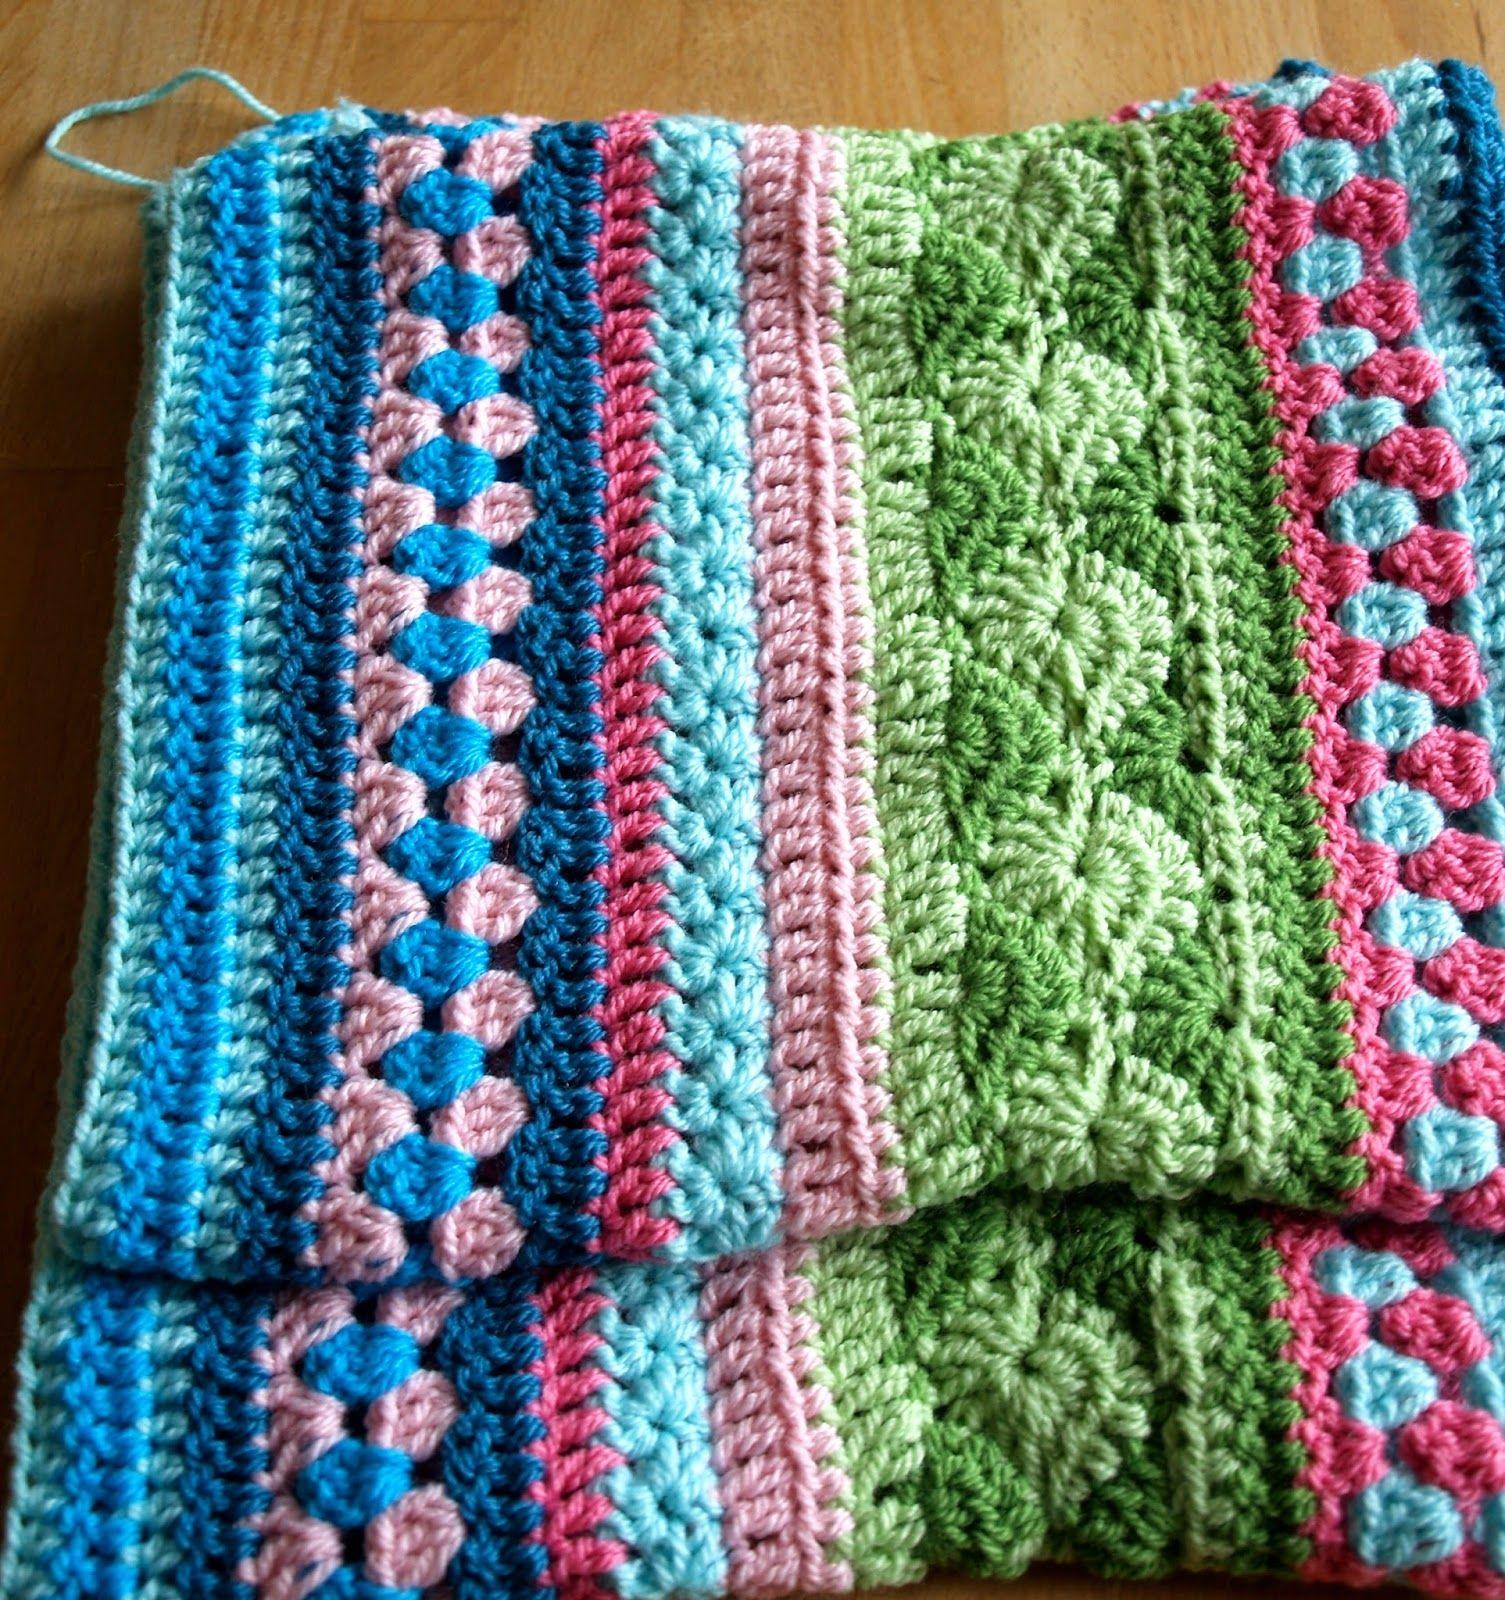 Famoso Crochet Patrones Afganos Festooning - Manta de Tejer Patrón ...